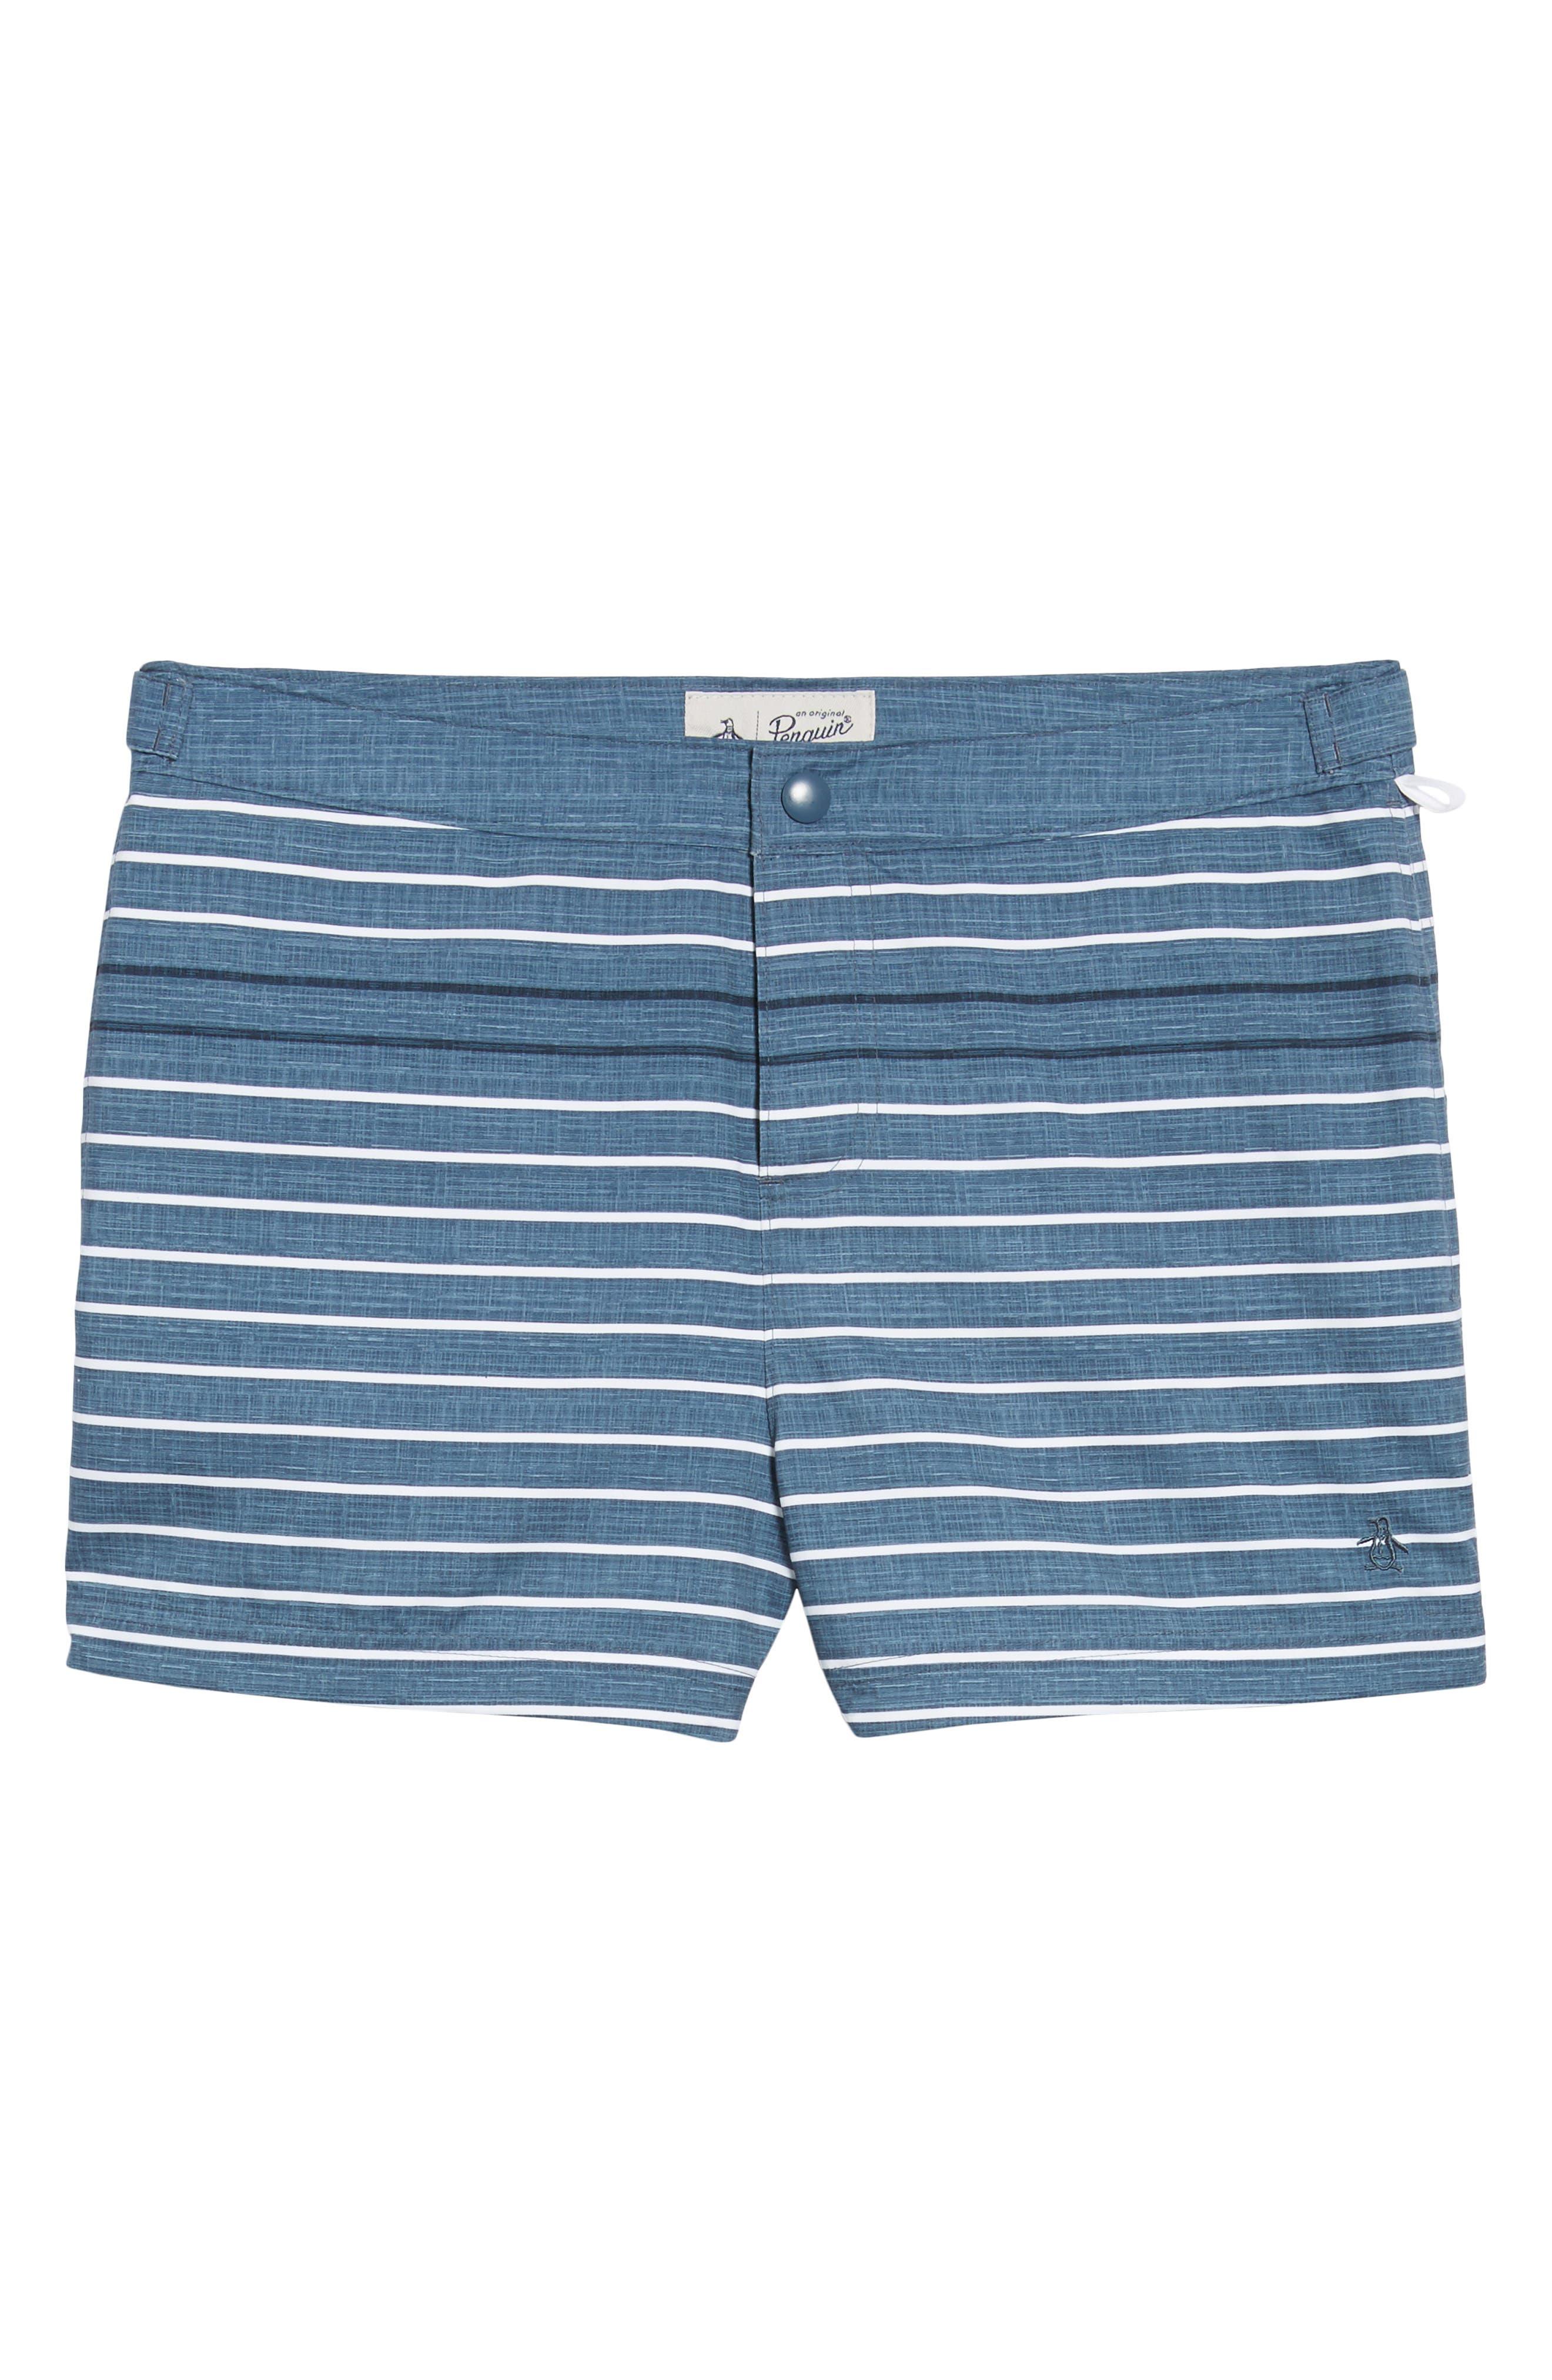 Feeder Stripe Board Shorts,                             Alternate thumbnail 6, color,